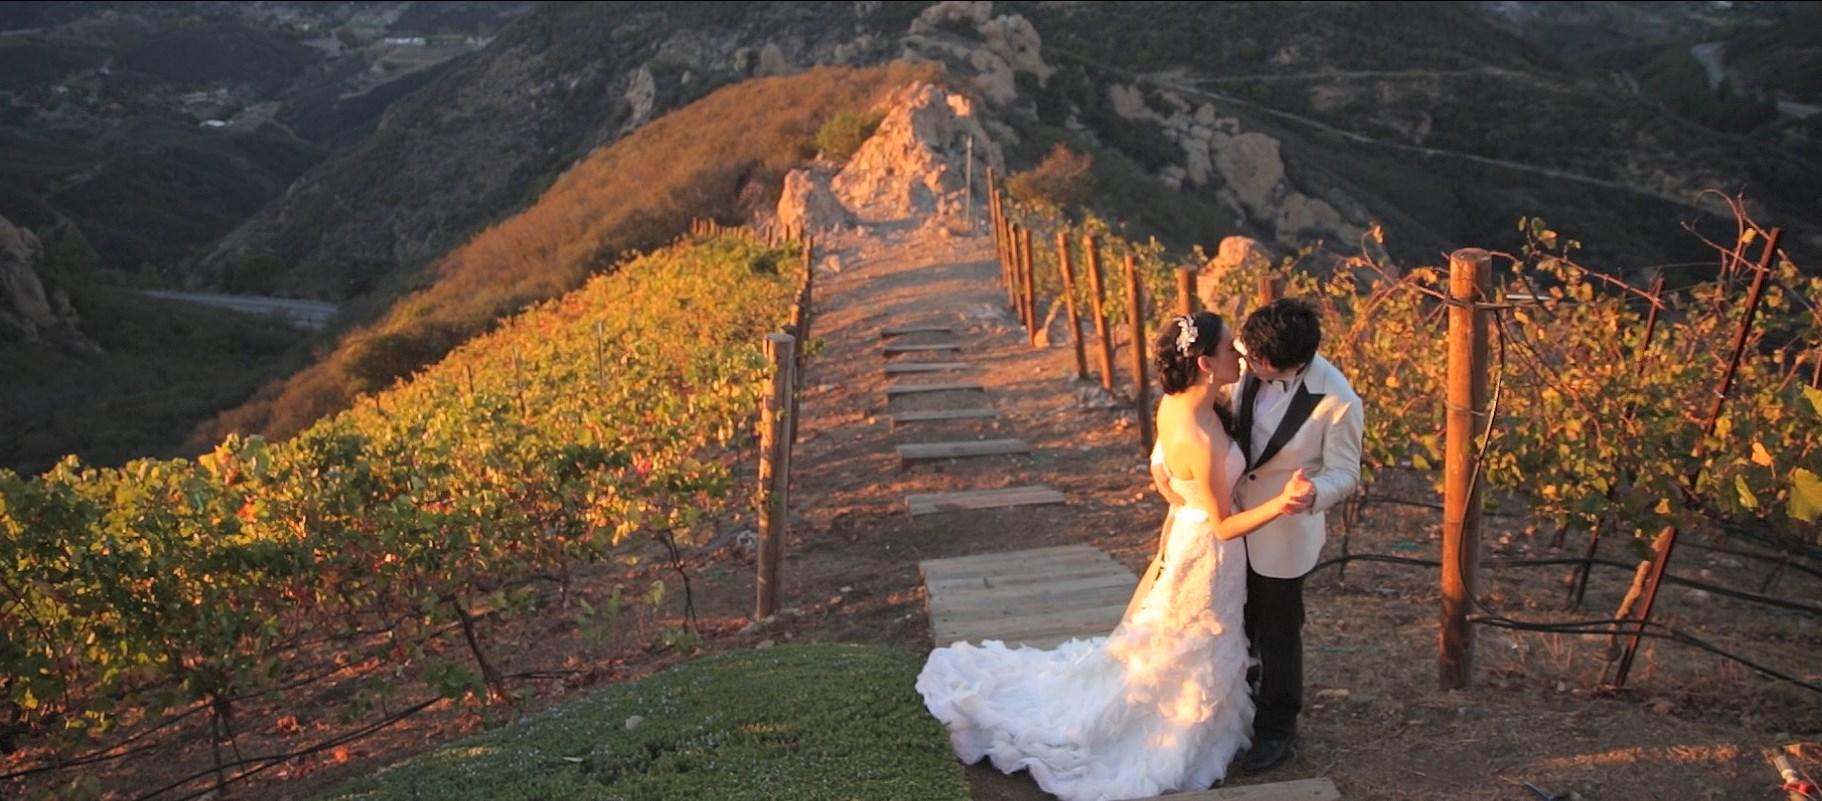 Malibu rocky oaks wedding videography jaime john for Malibu rocky oaks wedding price